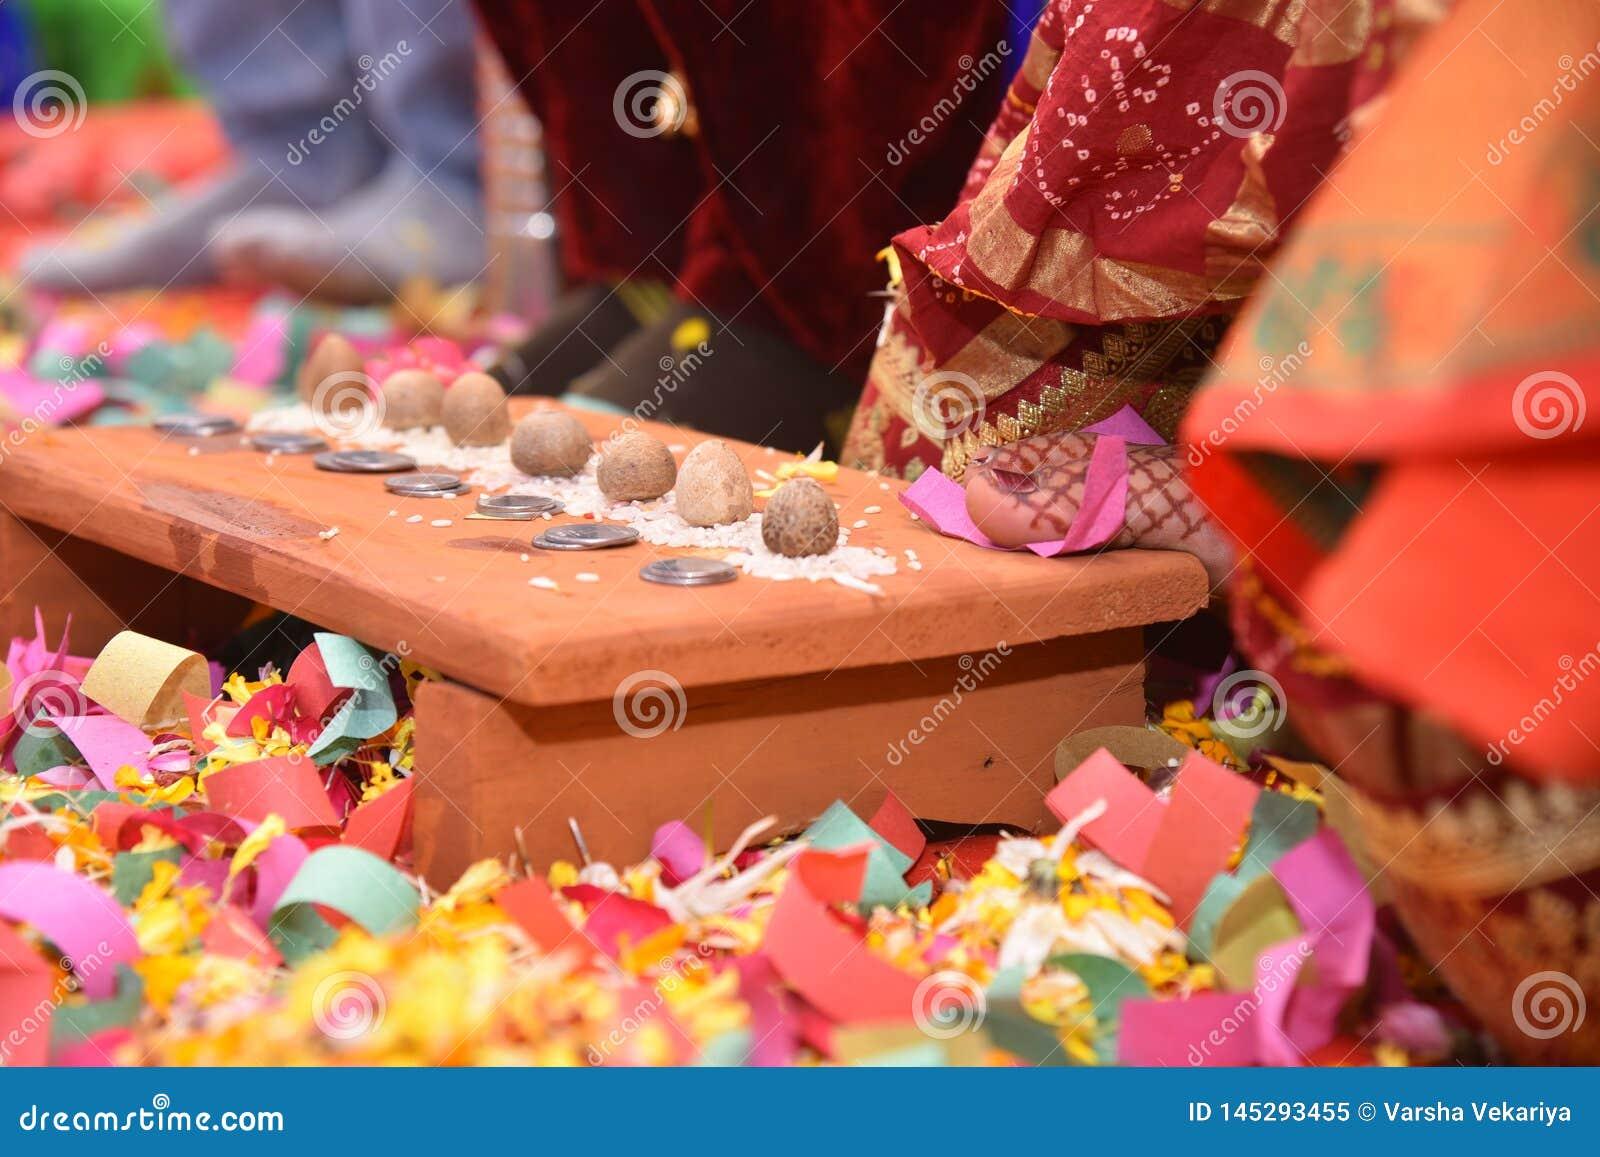 Nozze indiane tradizionali - Saptpadi - immagine